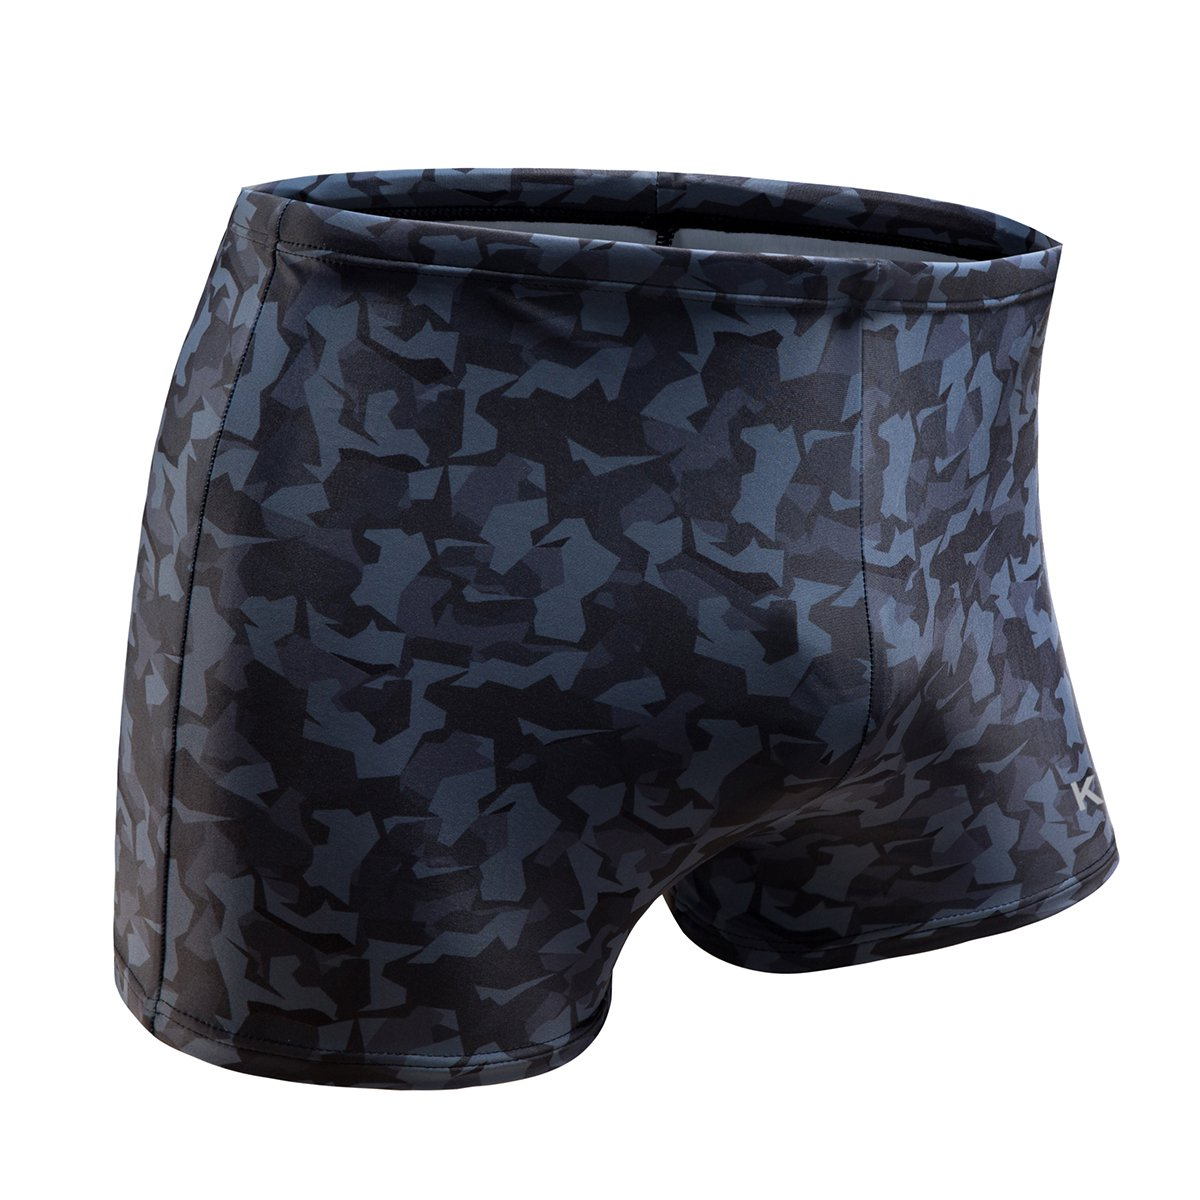 KGKE Swim Boxer Briefs Short Swim Jammer by Camo Racer Mens Square Leg Swimsuit (Grey Camo, M)